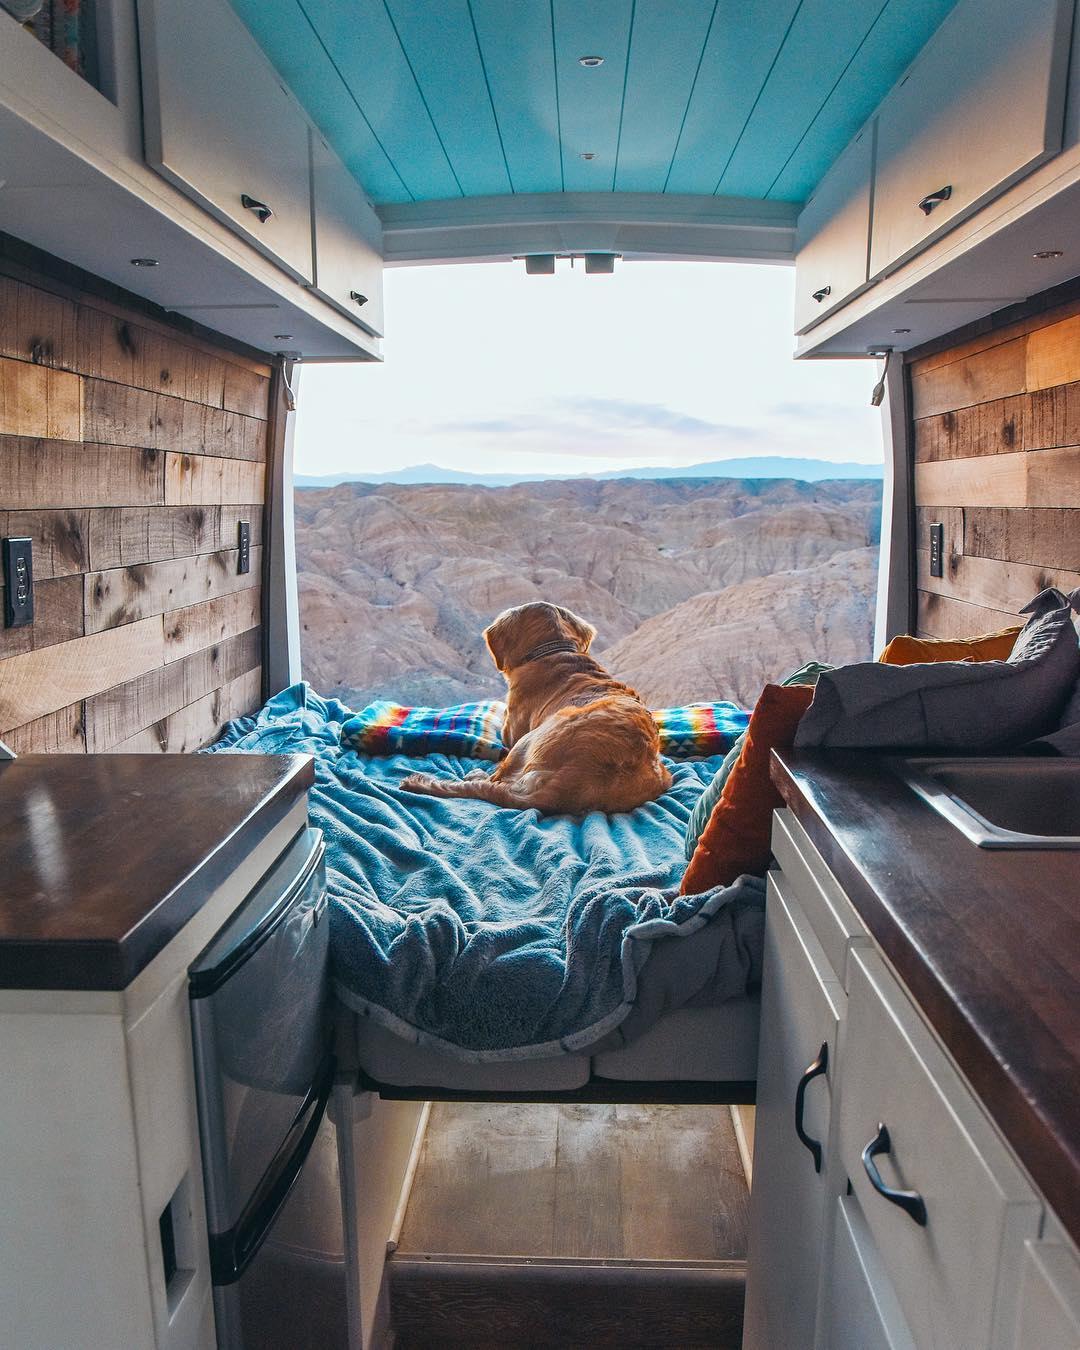 dog sitting in a diy camper van conversion